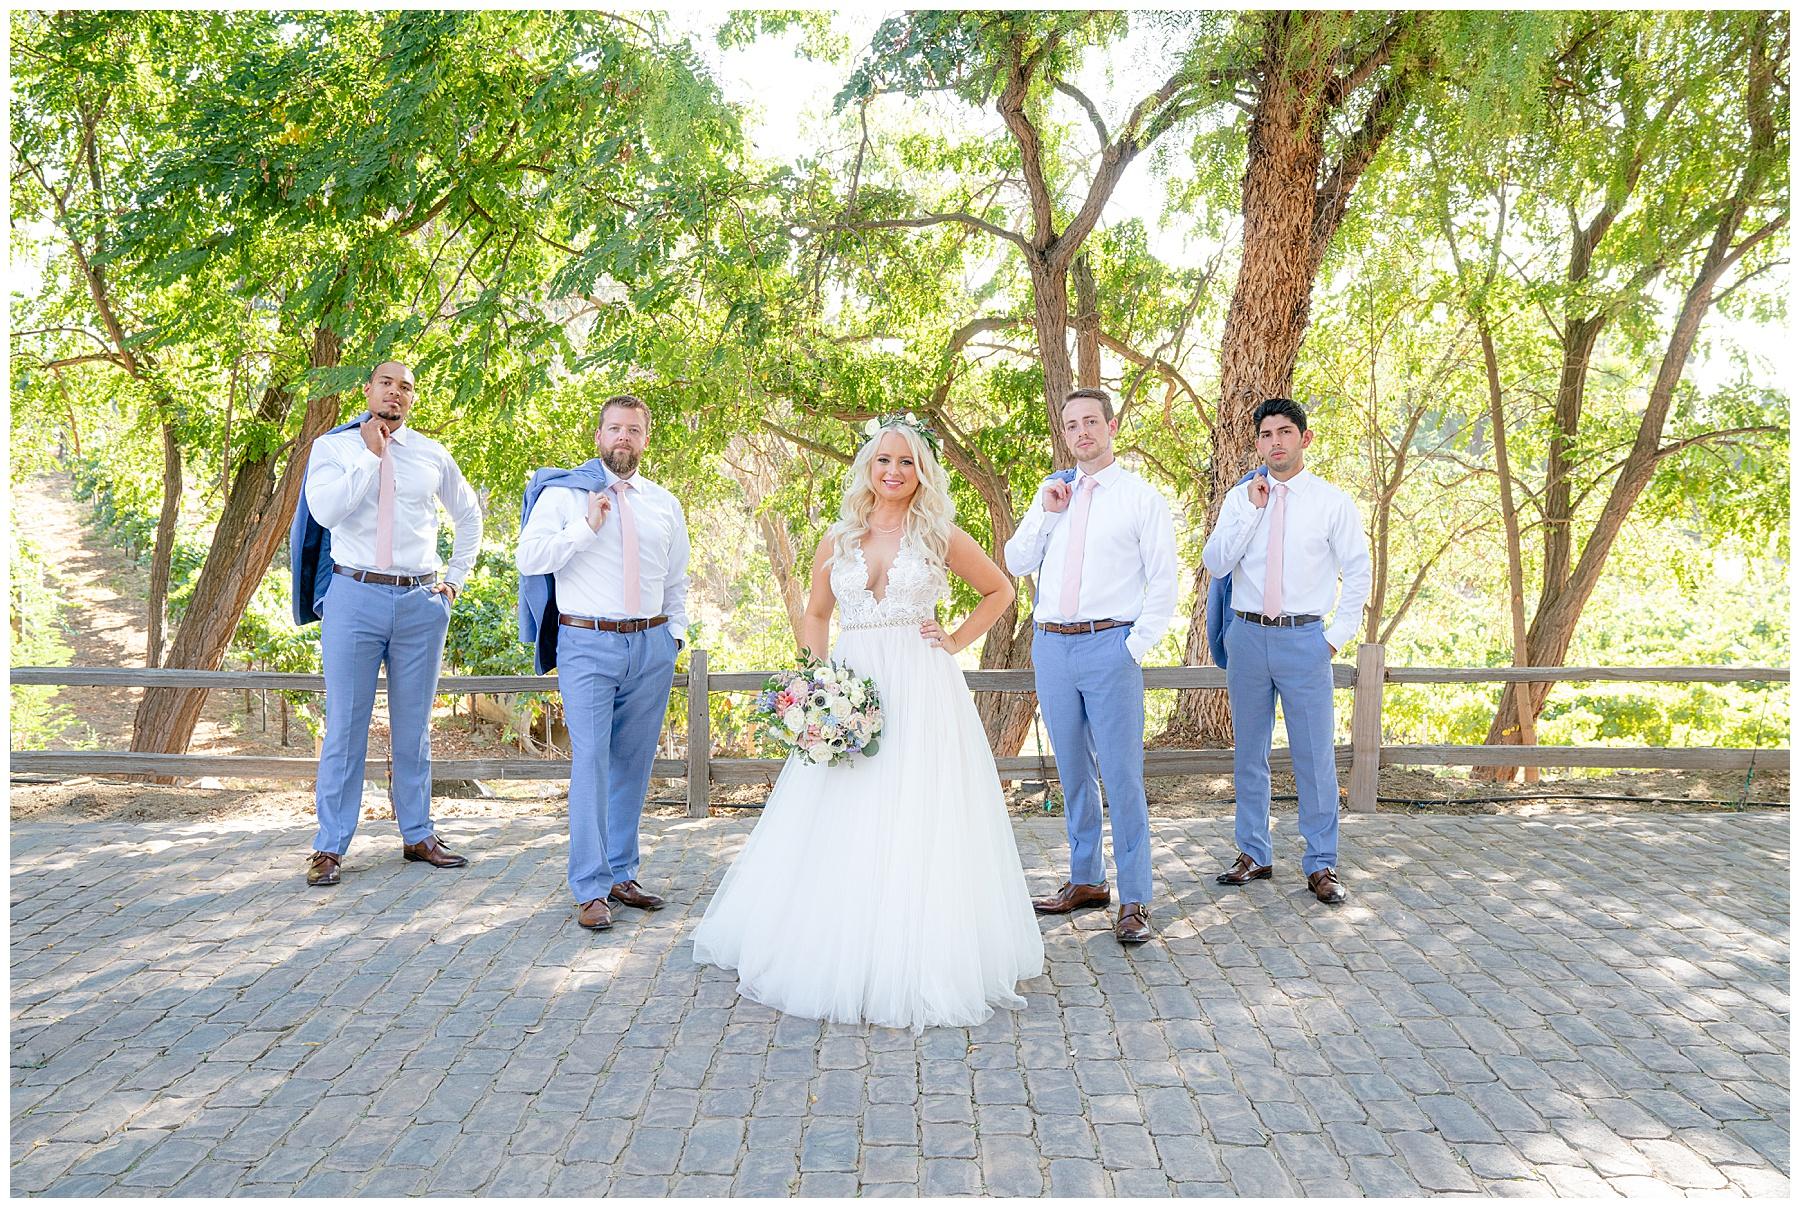 temecula winery wedding  bride and groomsmen